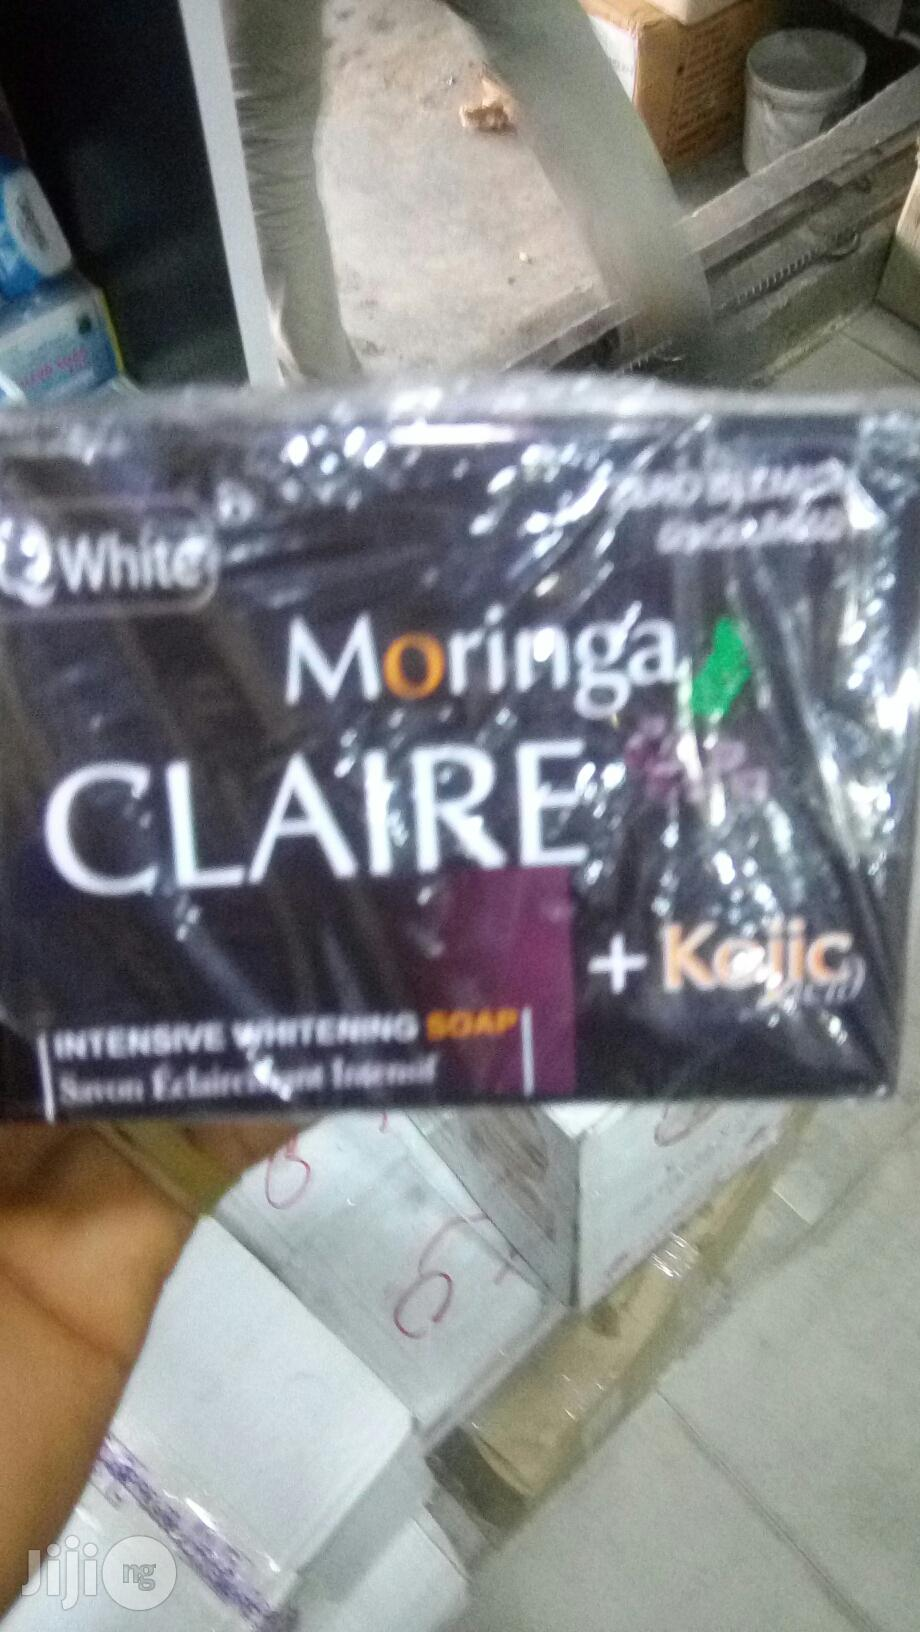 Moringa Claire Soap